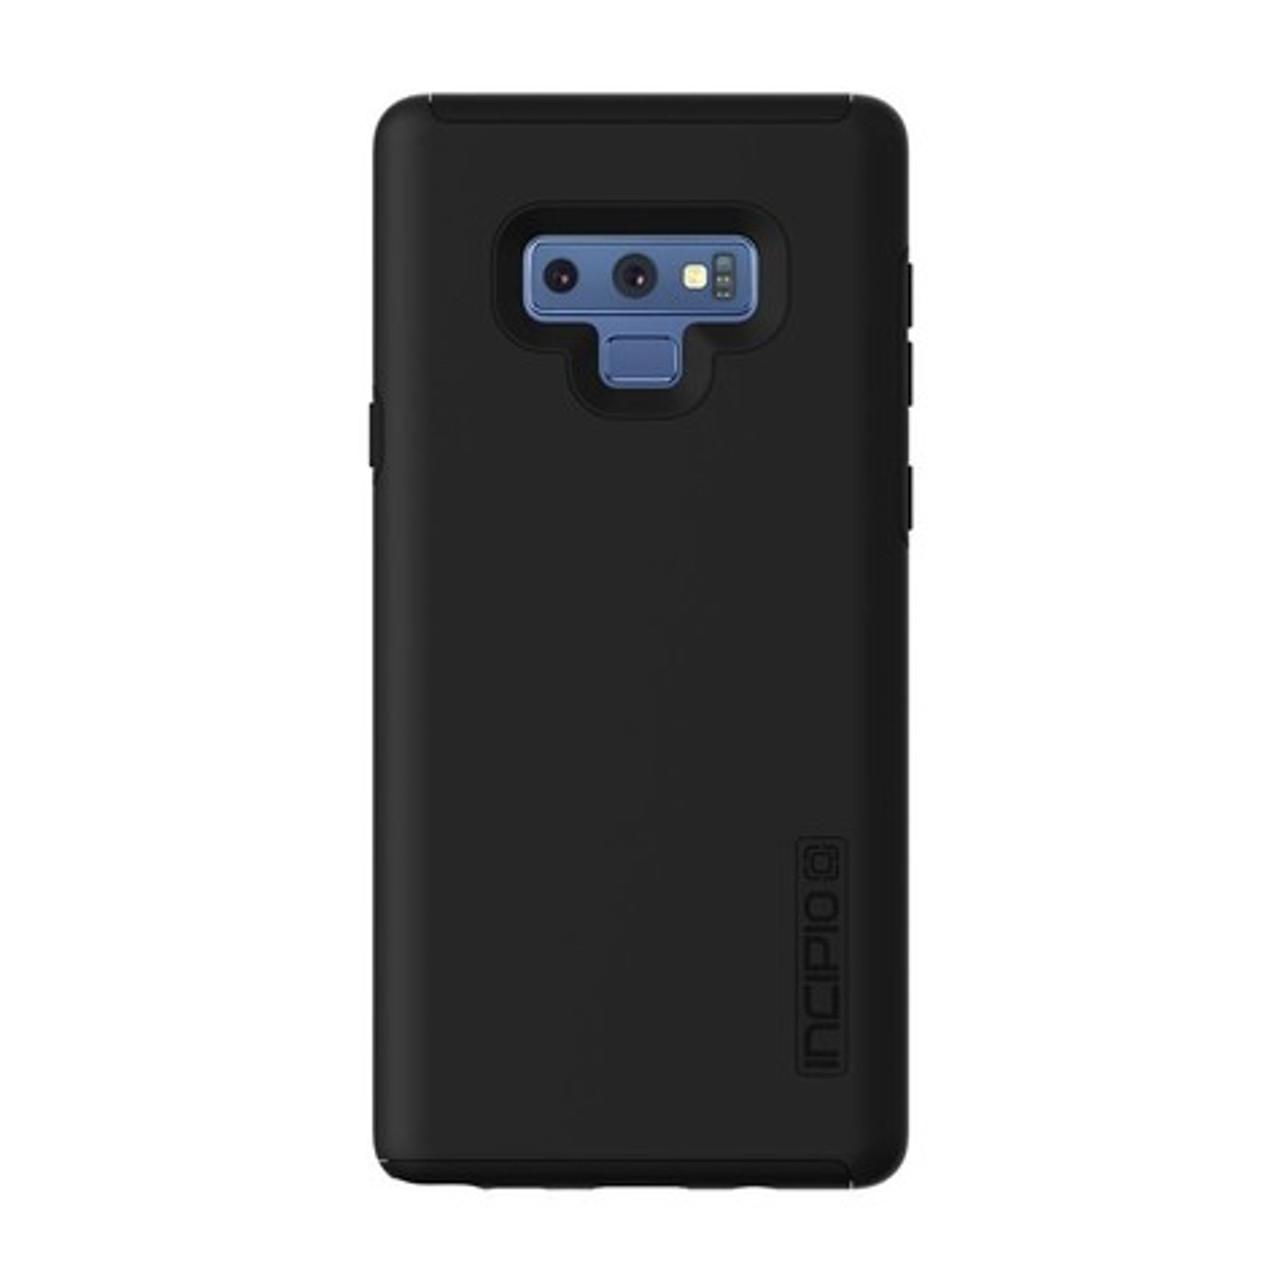 new concept c8cc8 d2871 Incipio DualPro Case for Samsung Galaxy Note 9 - Black